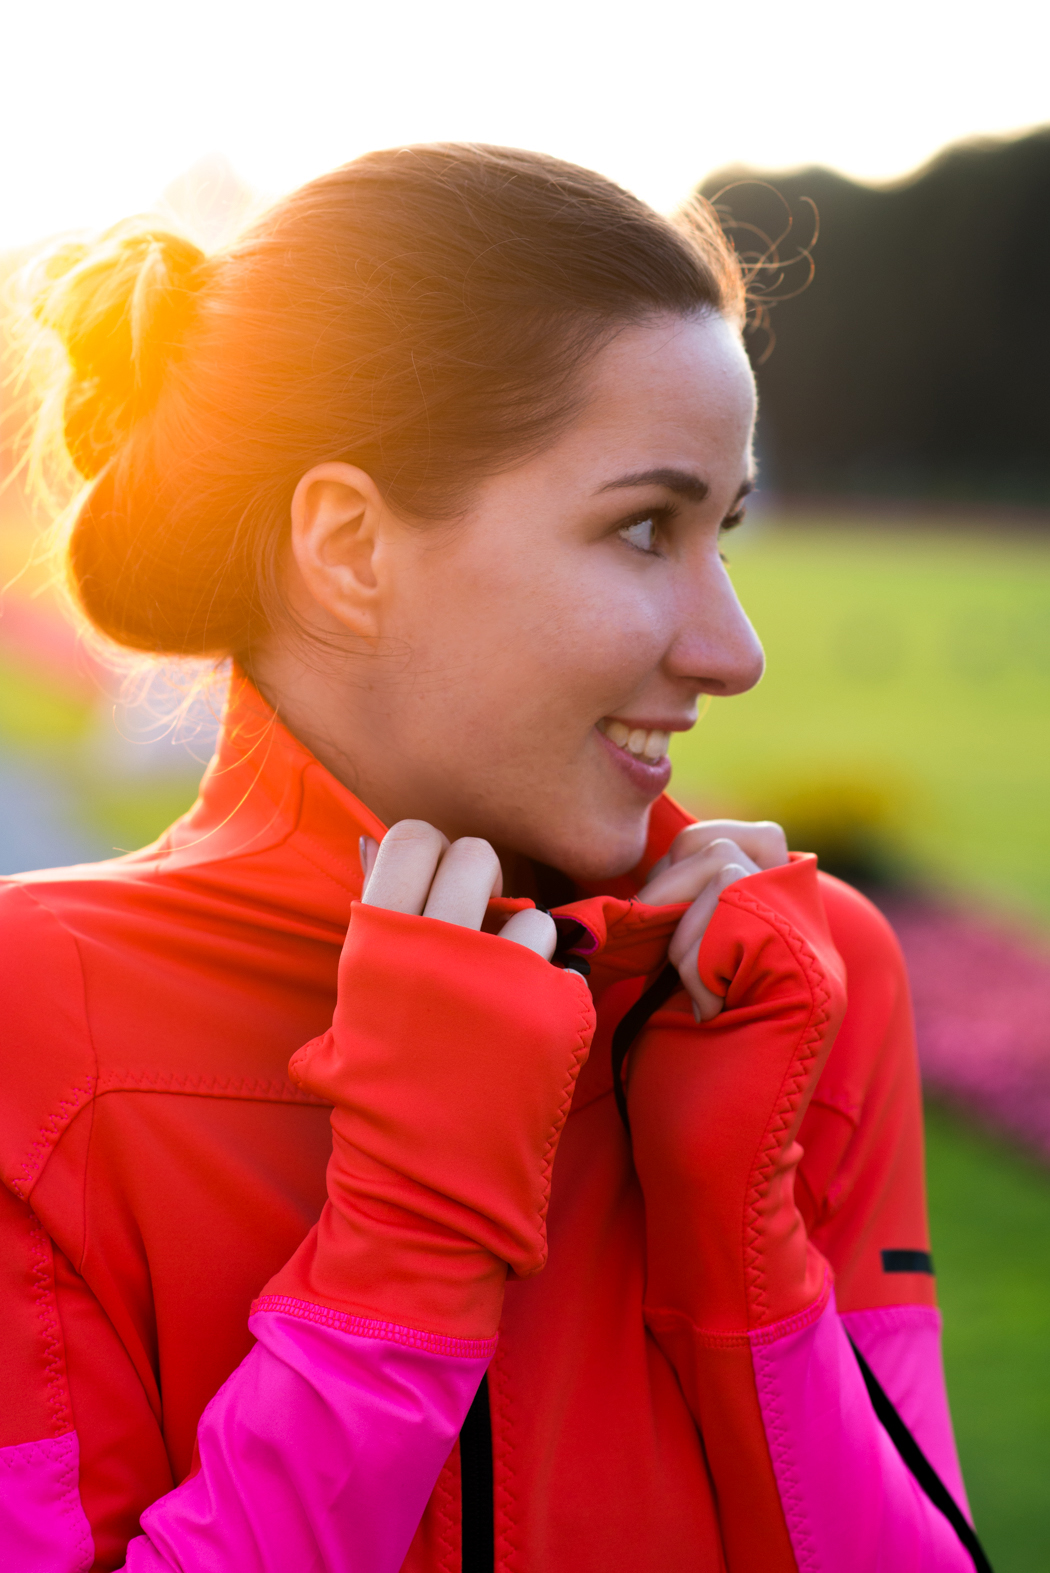 Laufoutfit-Adidas-Pink-Orange-Laufjacke-Fitnessblogger-München-7